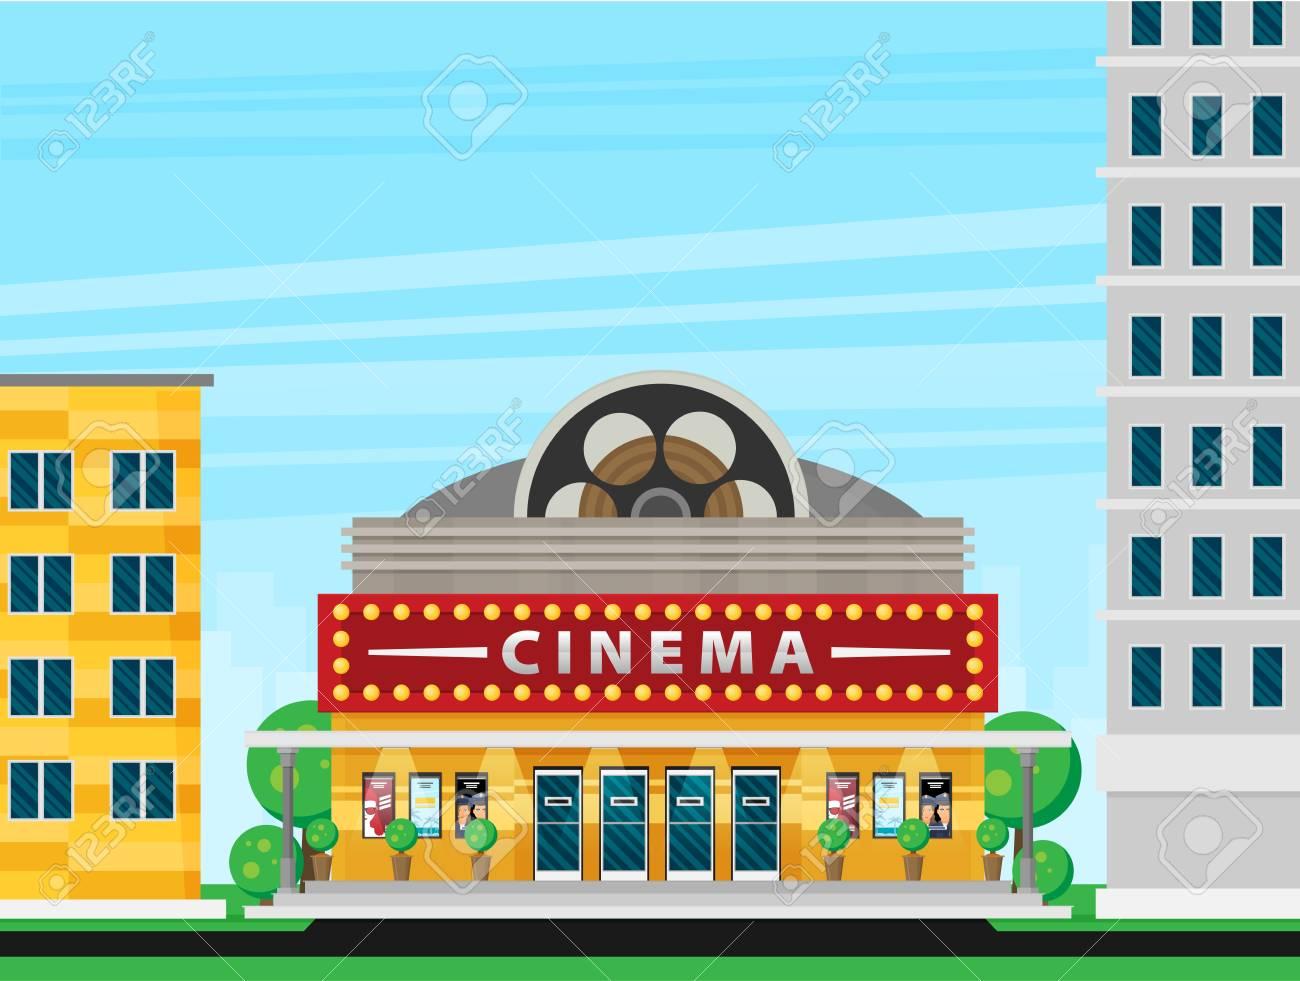 Cinema building flat style. Movie Theater. - 111523419